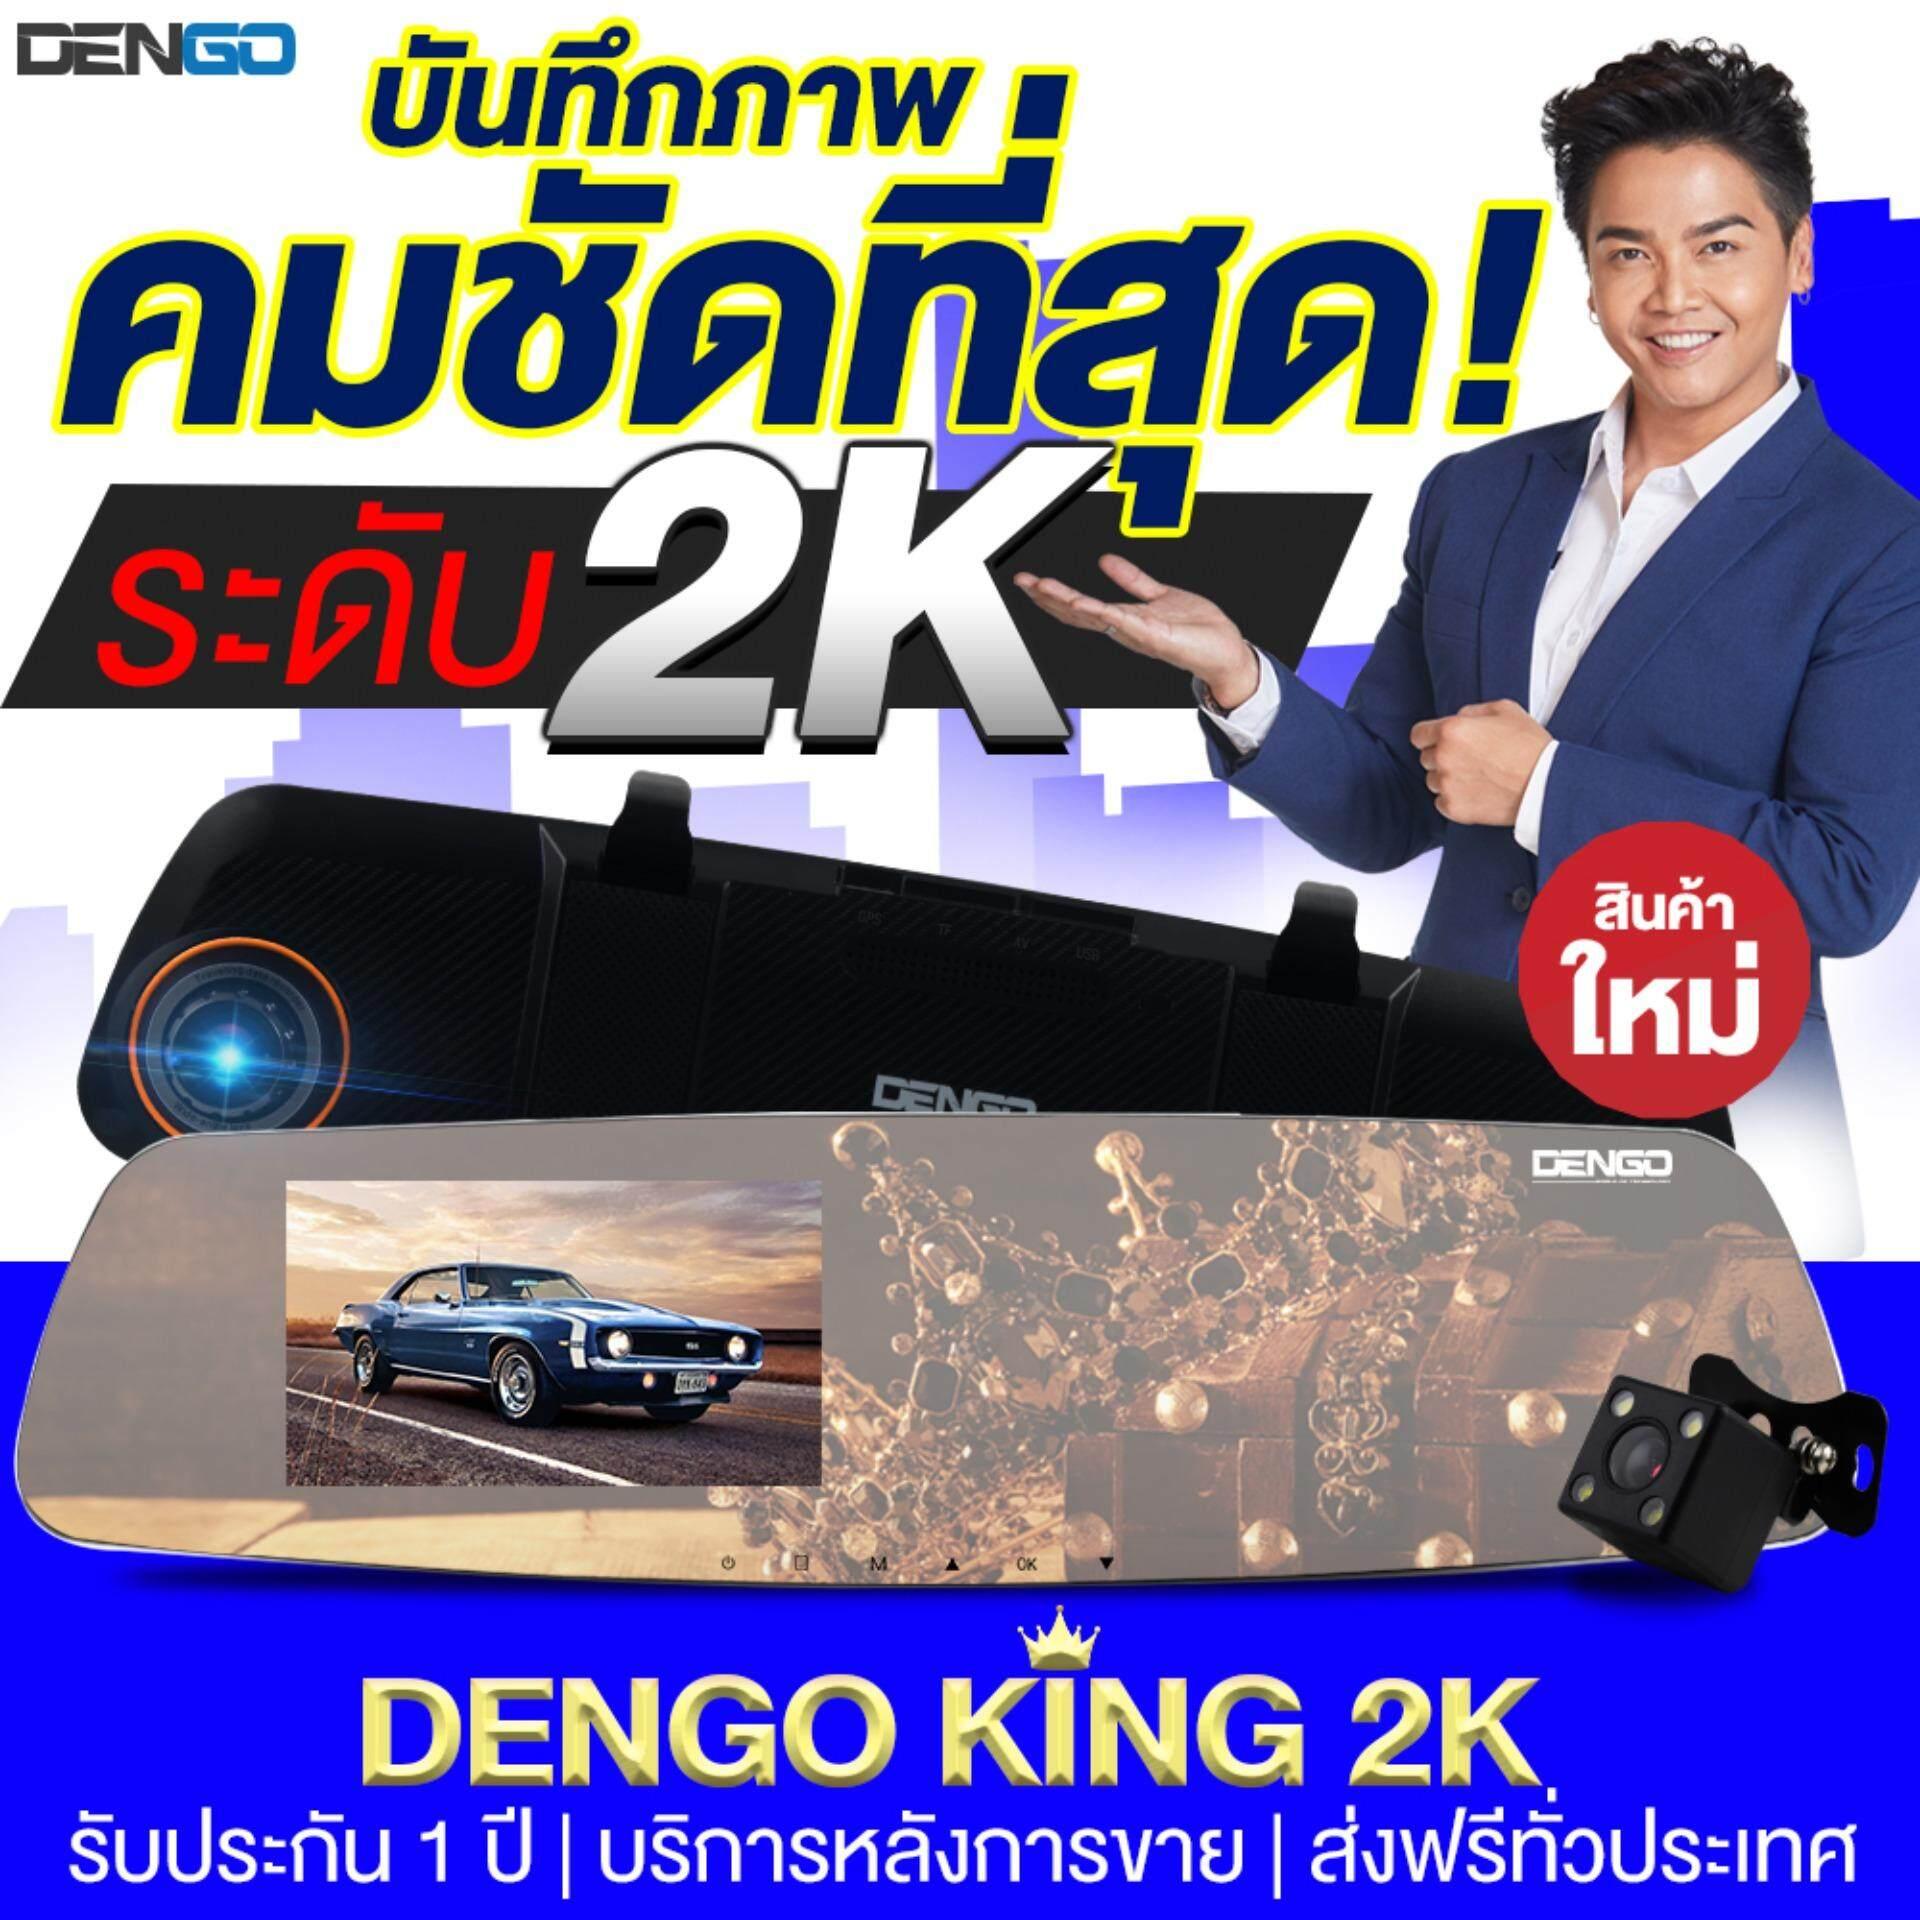 Dengo King 2k กล้องติดรถยนต์คมชัดระดับ 2k+เห็นทะเบียนชัดเจน+มี2กล้องหน้าหลัง+parking Mode+มีระบบเซฟอัตโนมัติเมื่อเกิดแรงสั่นสะเทือน+แจ้งเตือนออกนอกเลนอัจฉริยะ.